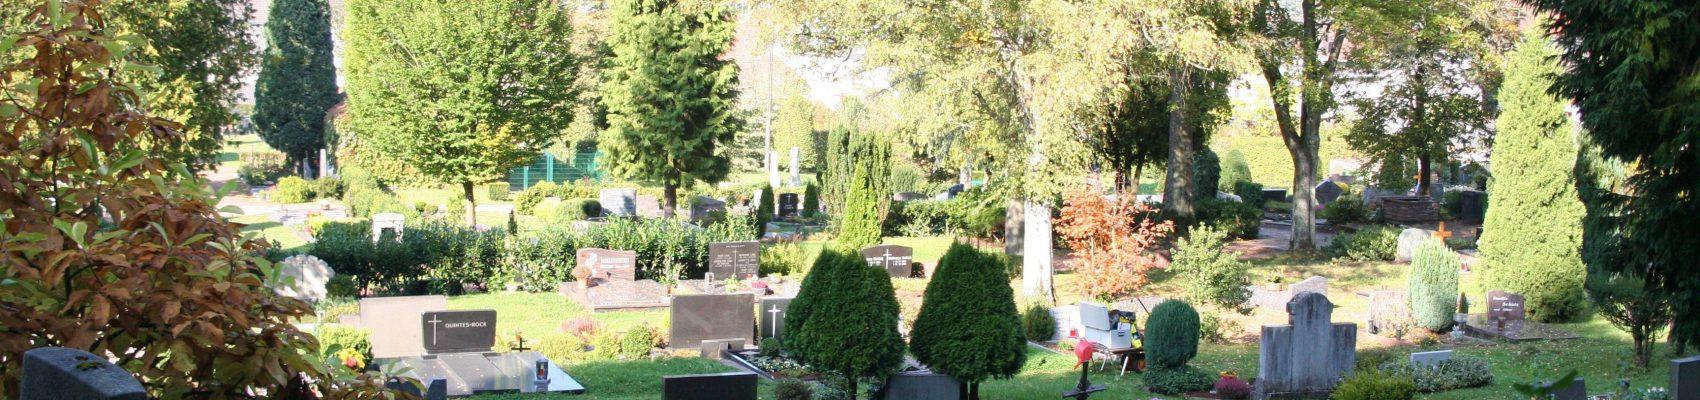 Friedhof Merzig Propsteistraße